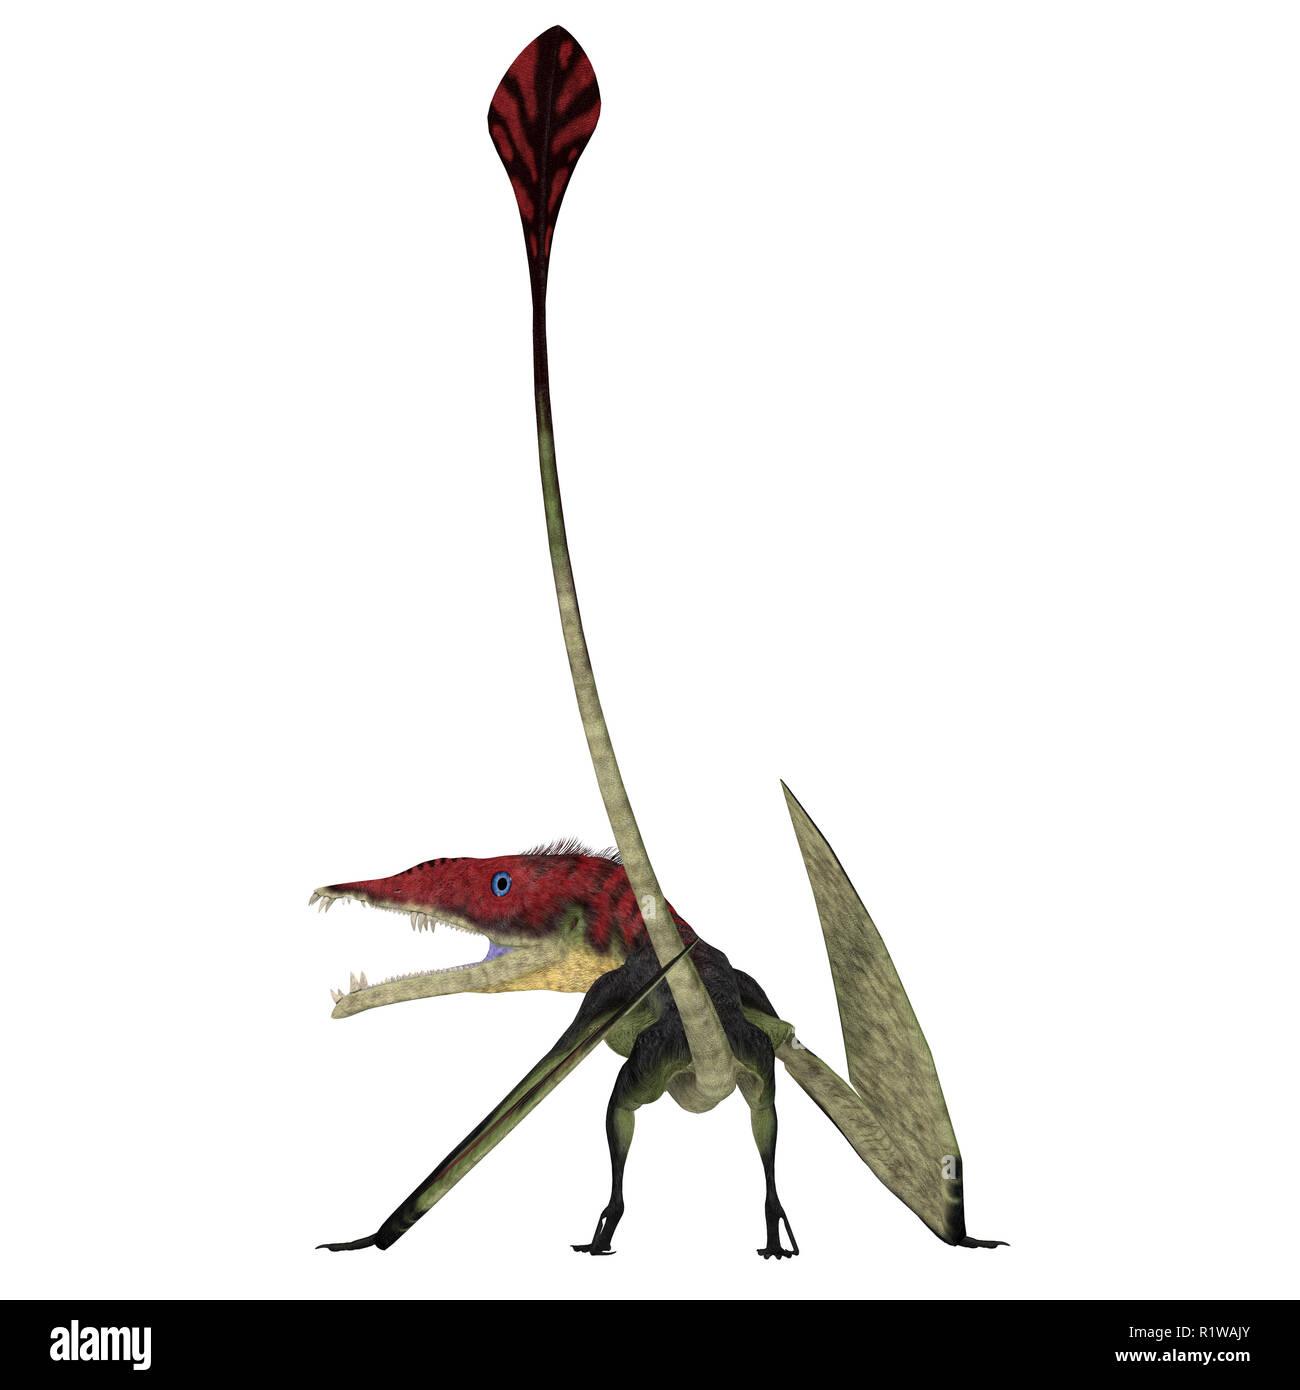 Eudimorphodon Pterosaur Tail - Eudimorphodon was a carnivorous Pterosaur bird that lived in Italy during the Triassic Period. - Stock Image